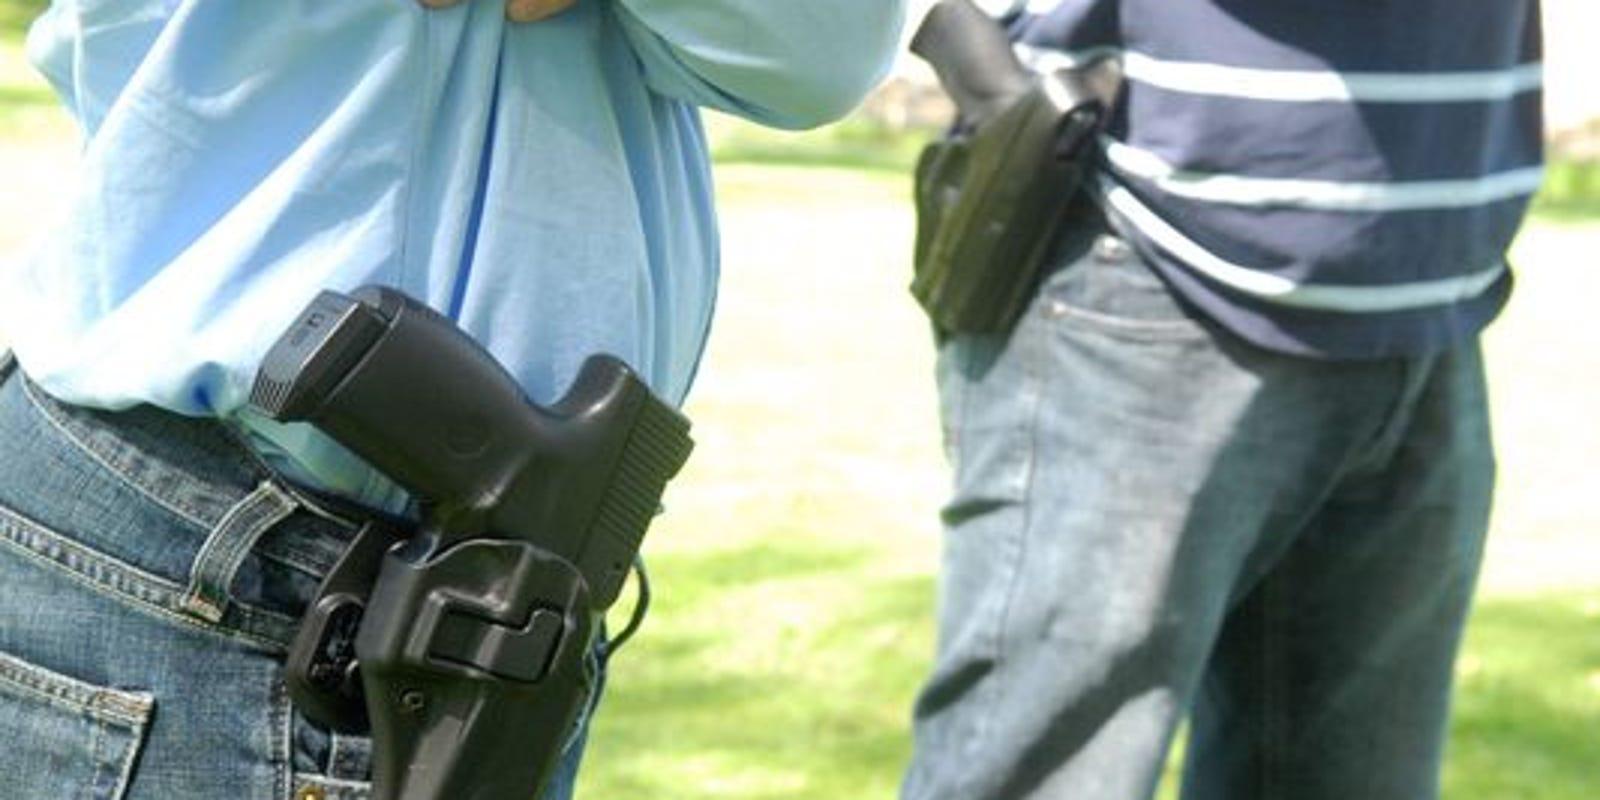 Don't want armed Nazis? Fix Michigan's open carry gun laws